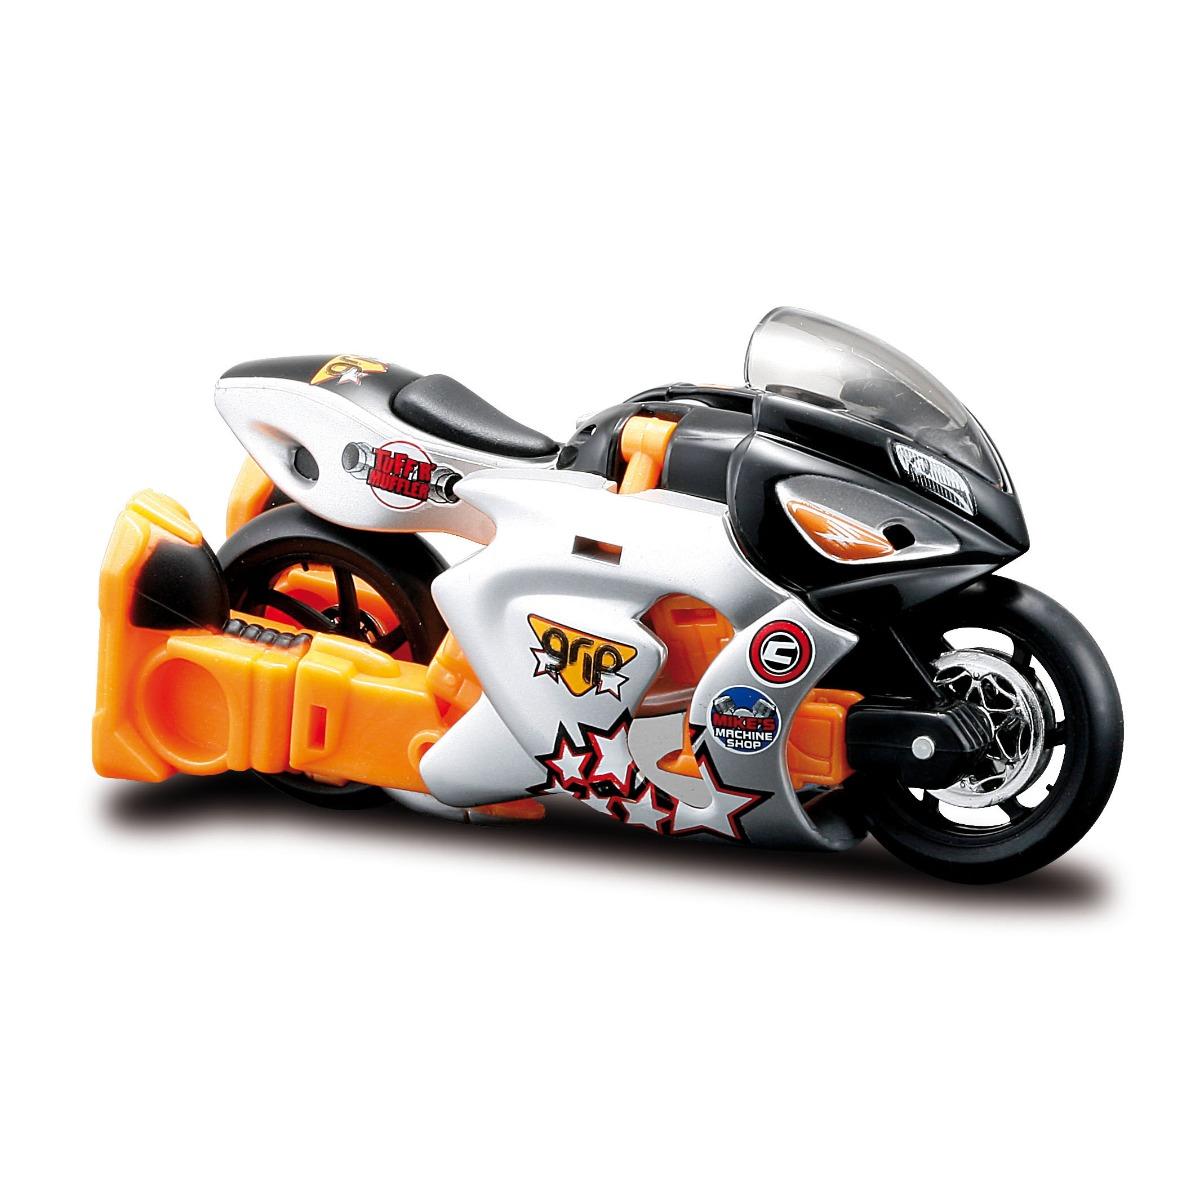 Motocicleta transformabila Maisto Cykons, 1:18, Grip